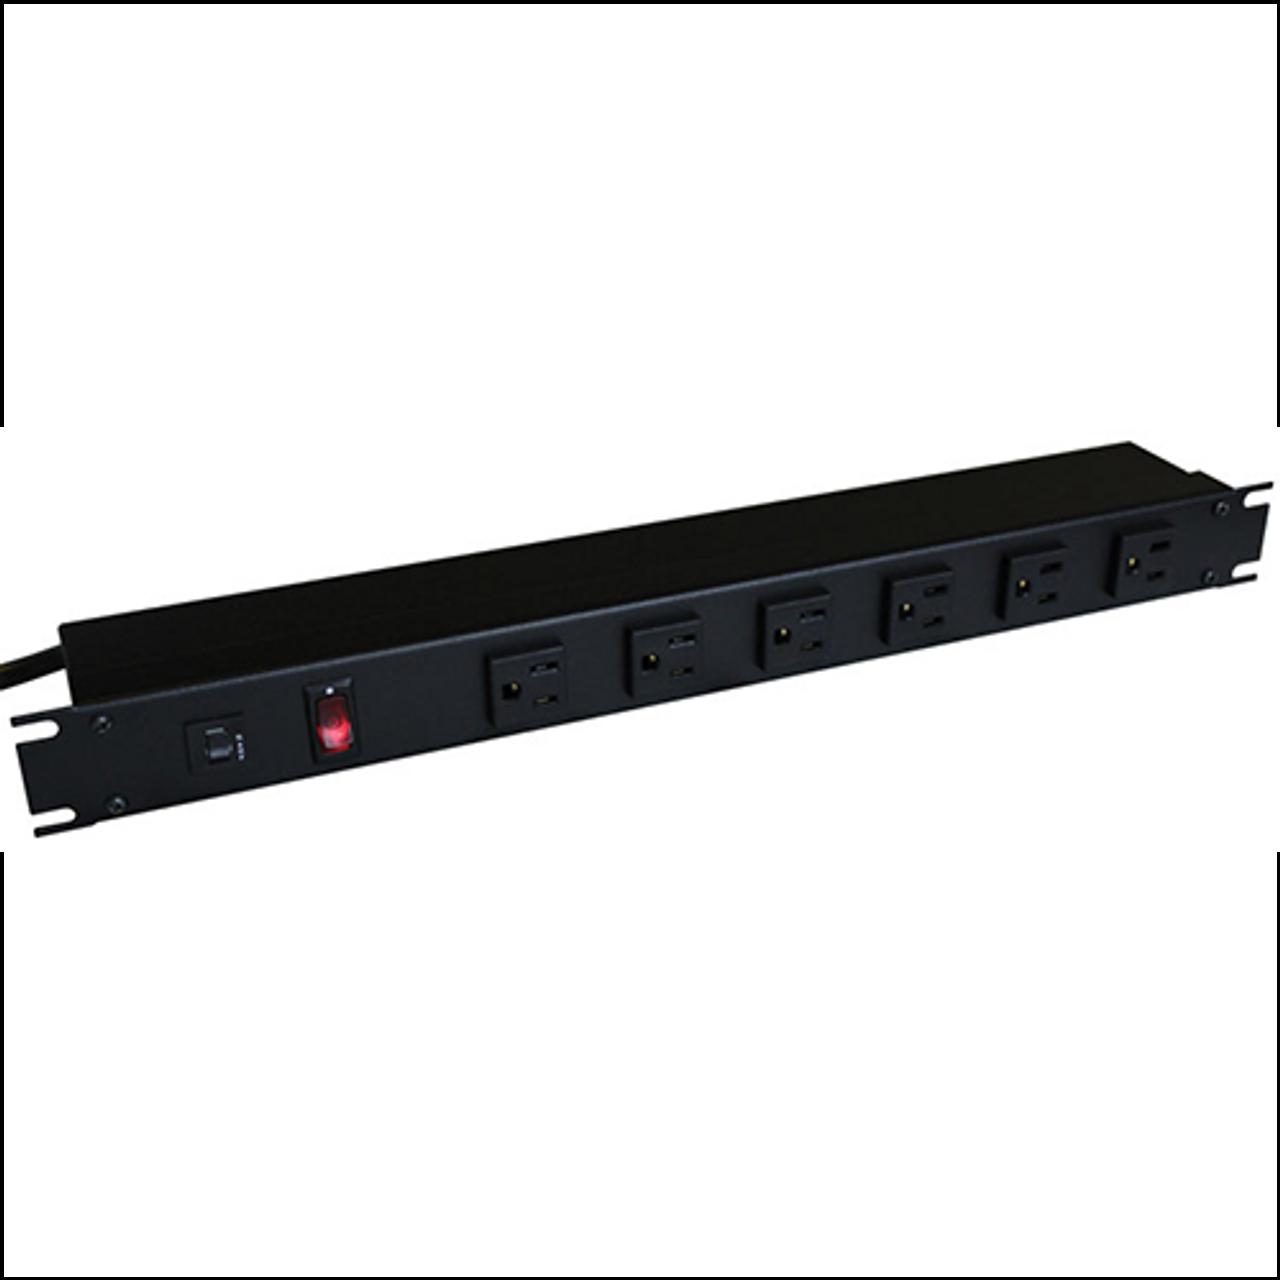 Industrial rack mount power strip